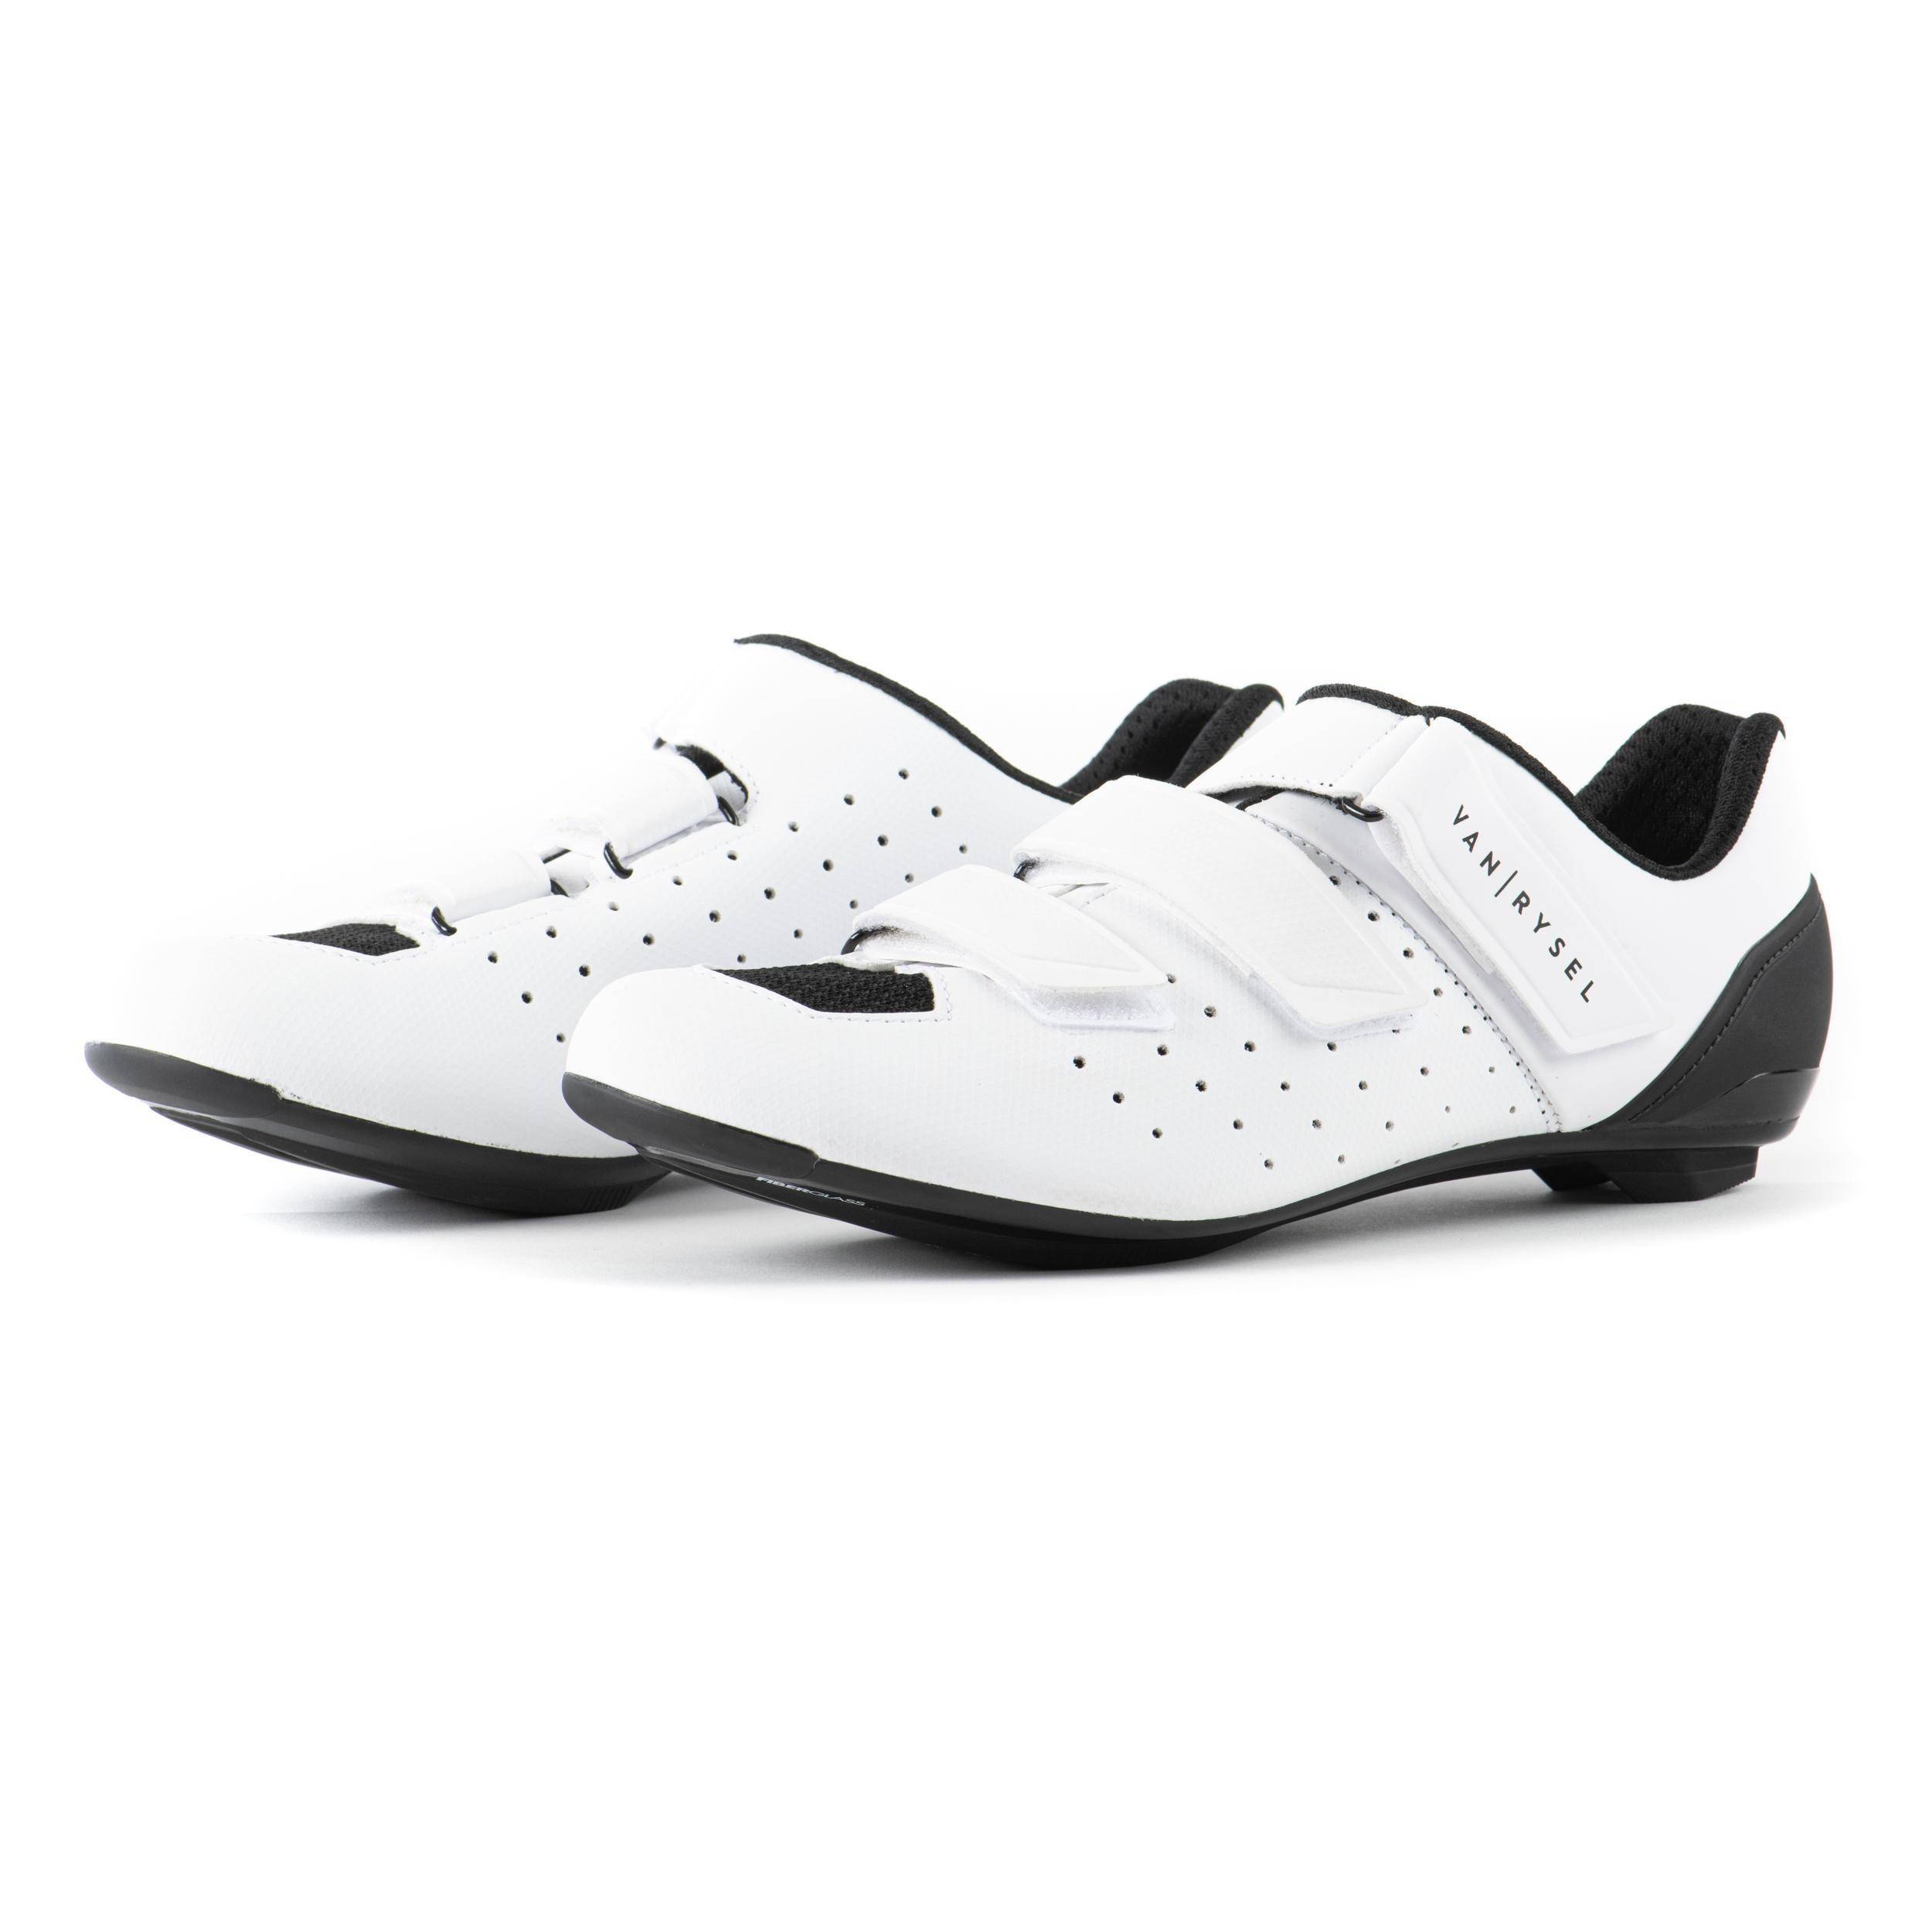 Fahrrad-Schuhe Rennrad RR 500   Schuhe > Sportschuhe > Fahrradschuhe   Van rysel